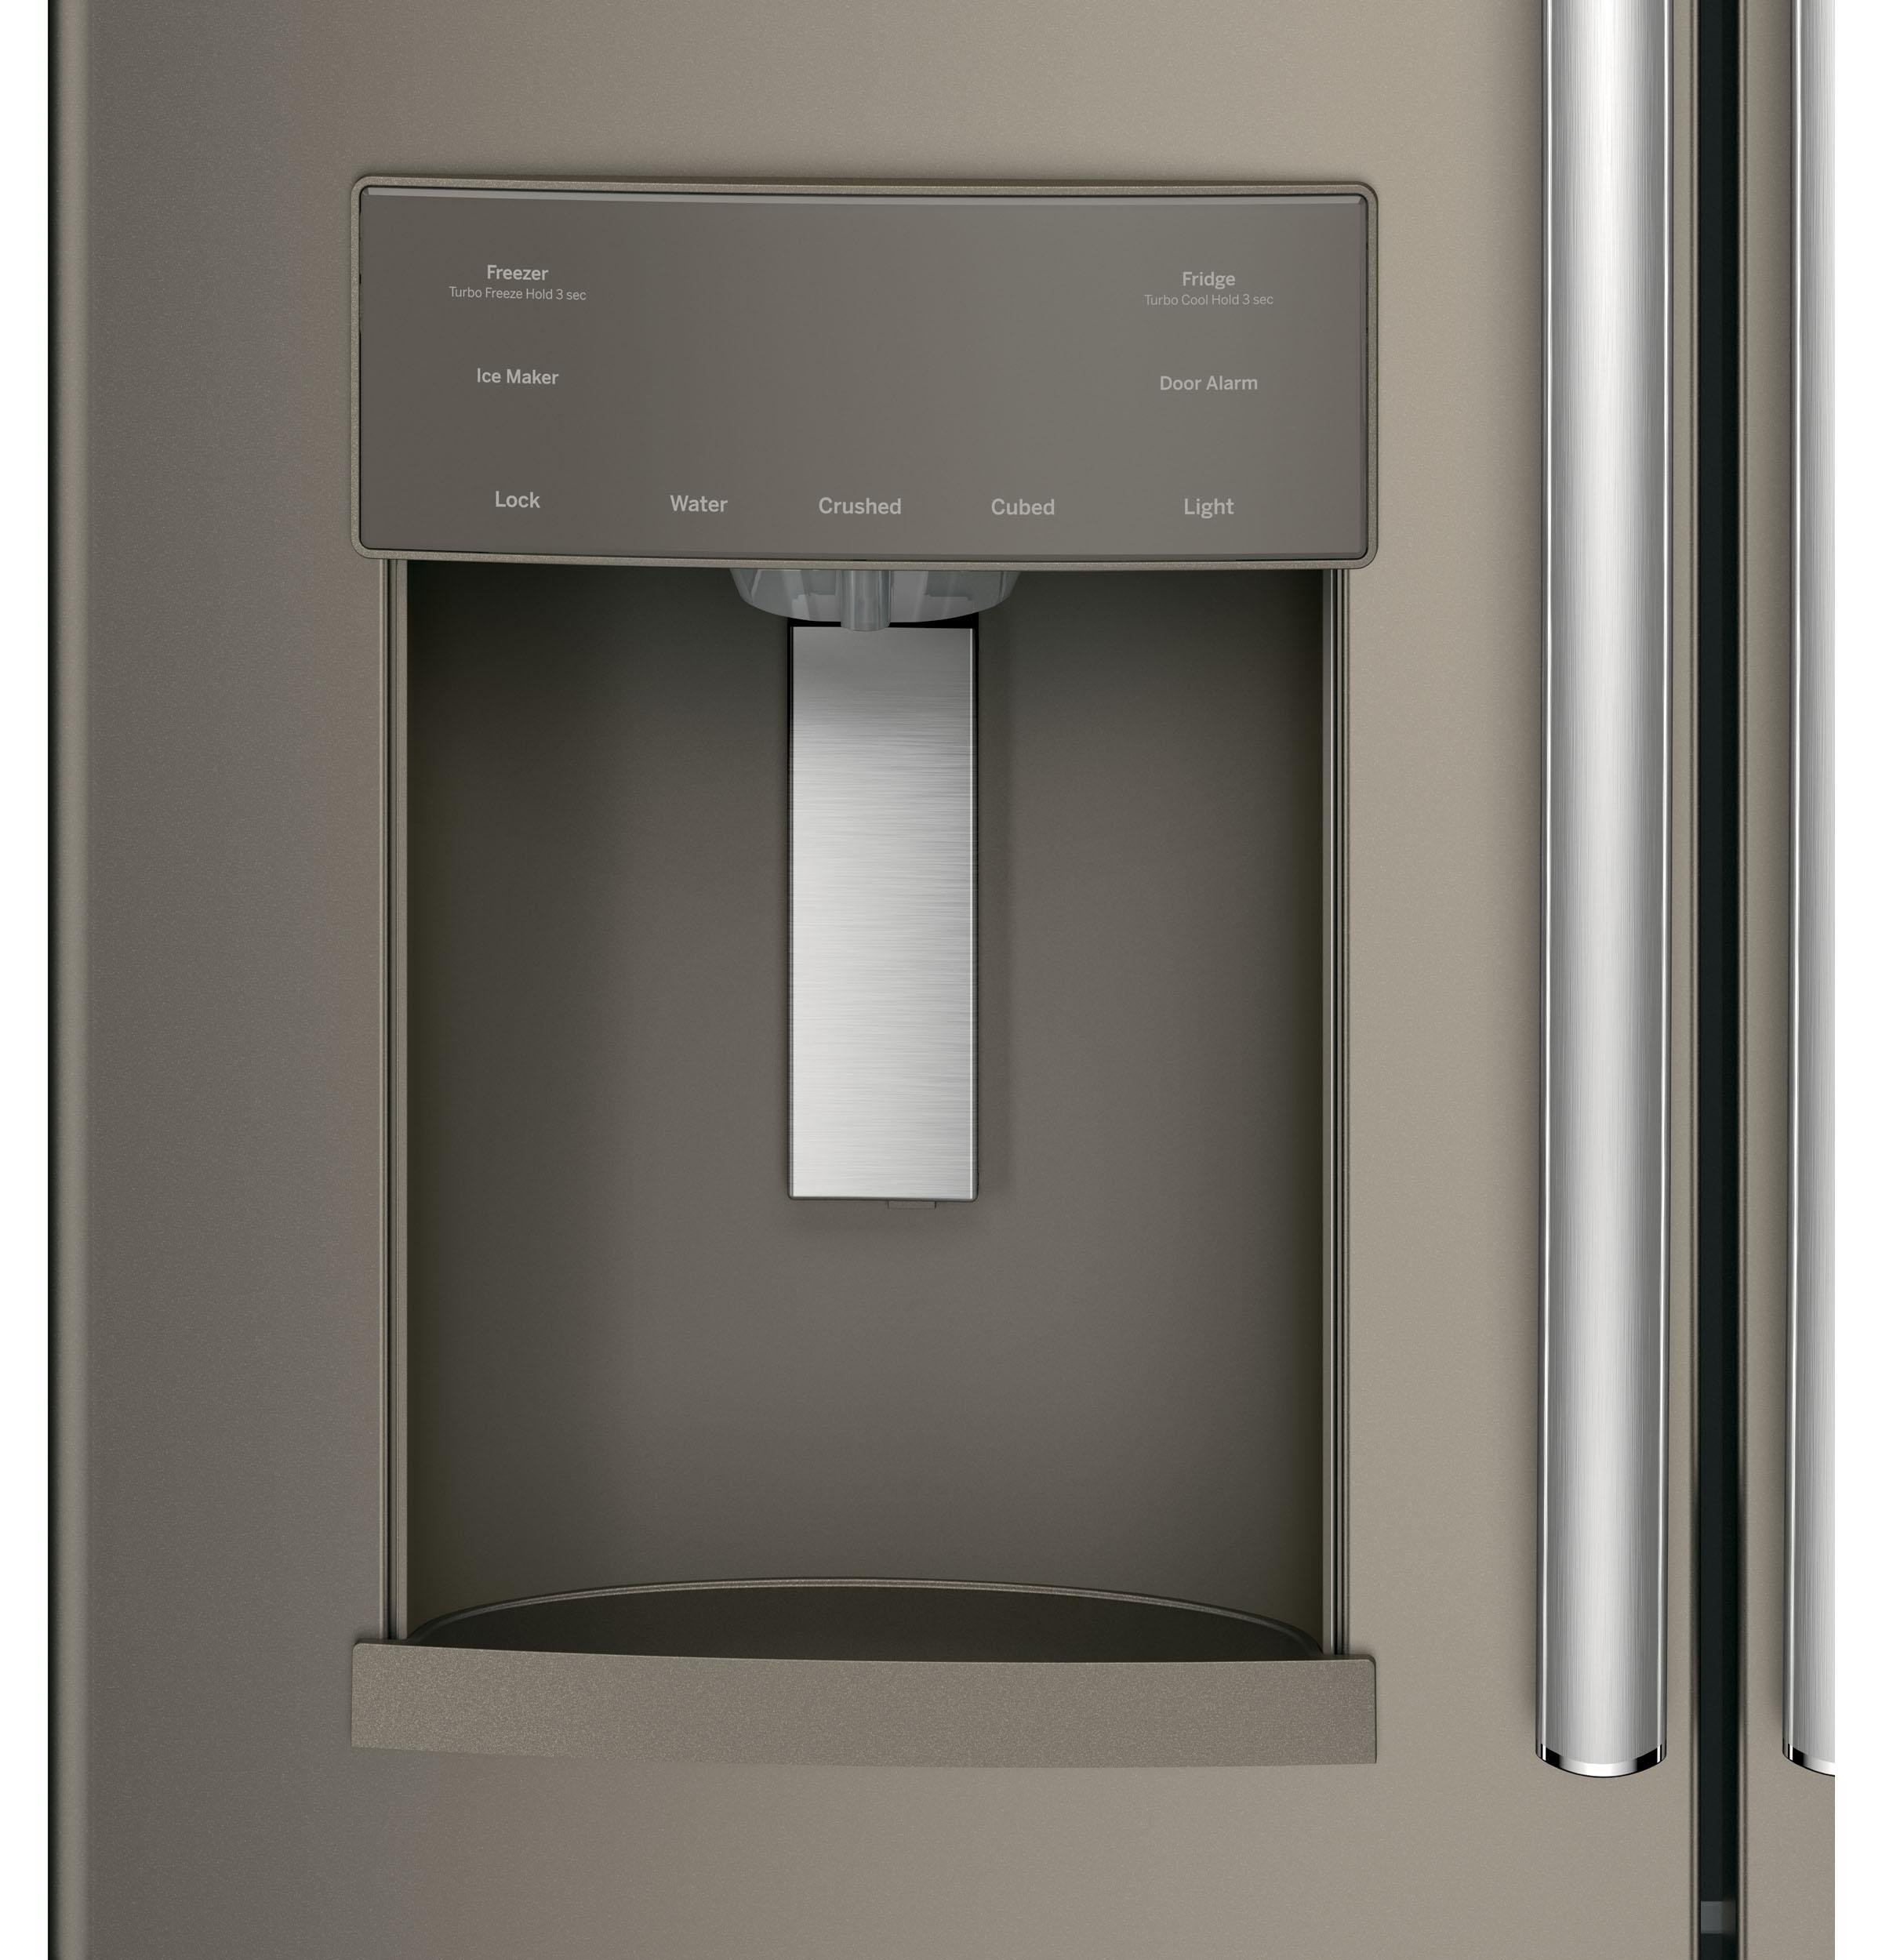 Model: GFE28GMKES | GE® ENERGY STAR® 27.8 Cu. Ft. French-Door Refrigerator